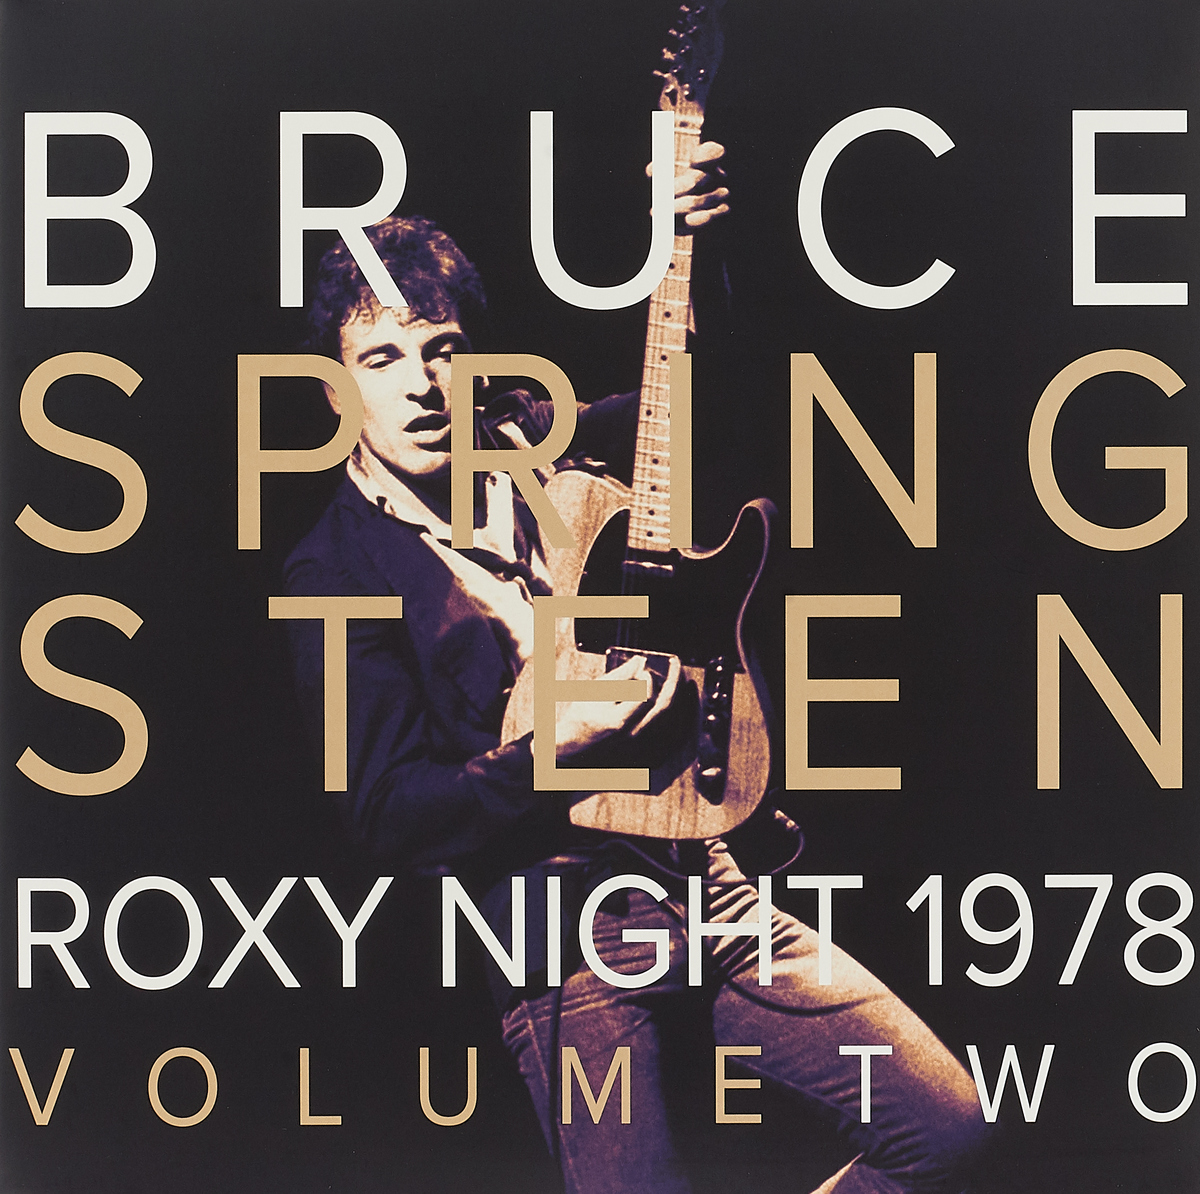 Брюс Спрингстин Bruce Springsteen. 1978 Roxy Night Vol.2 (2 LP) брюс спрингстин bruce springsteen passaic night 1978 the classic new jersey broadcast volume two 2 lp